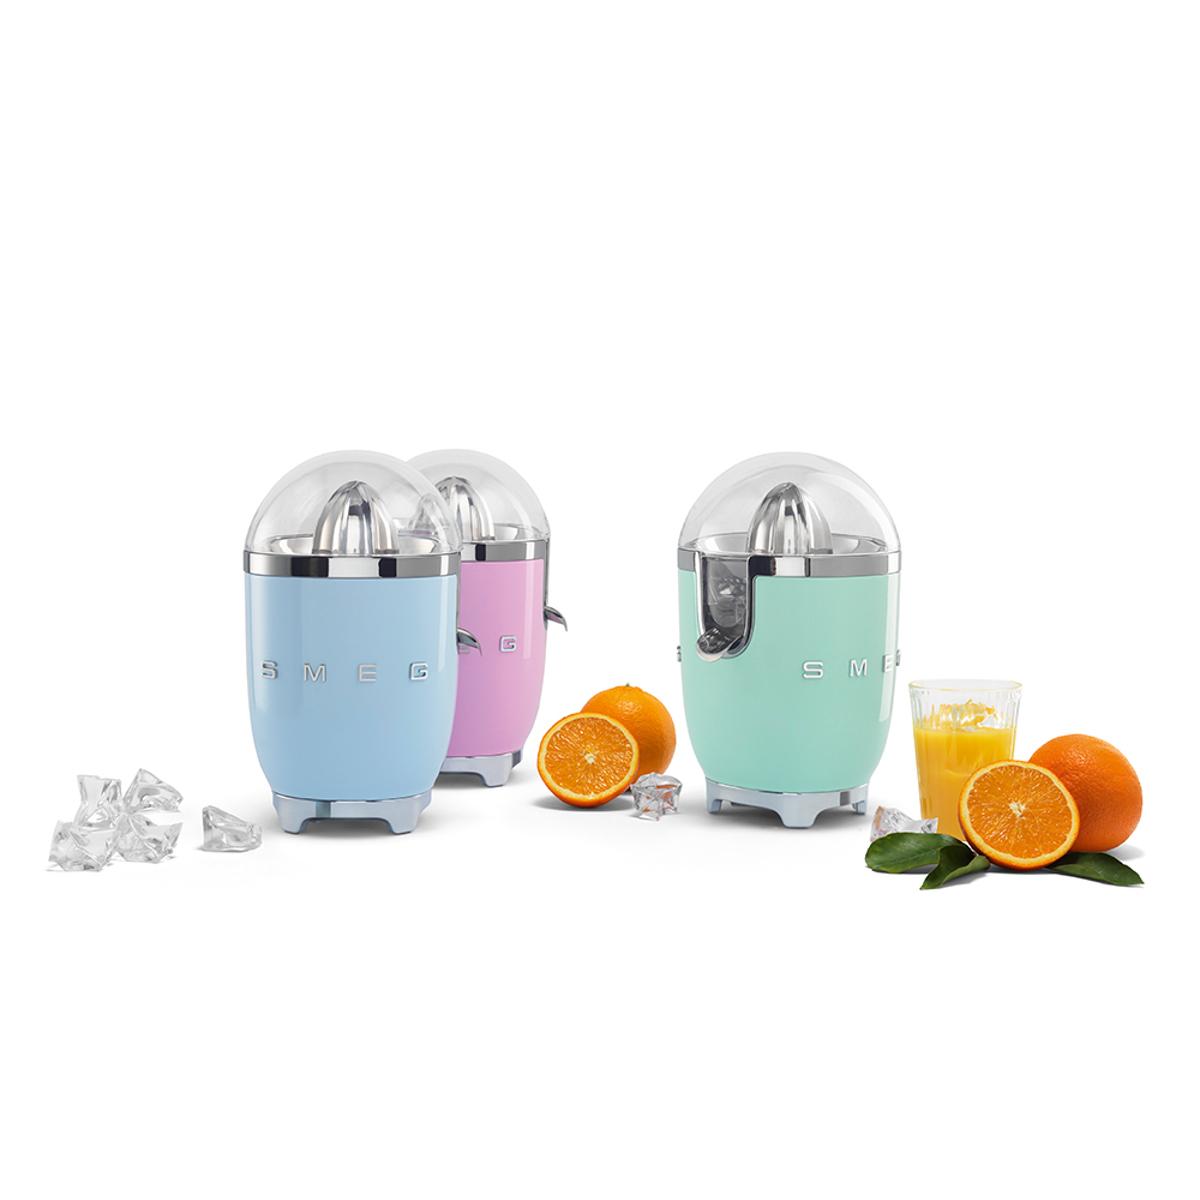 Smeg CJF01PKUK Citrus Juicer with